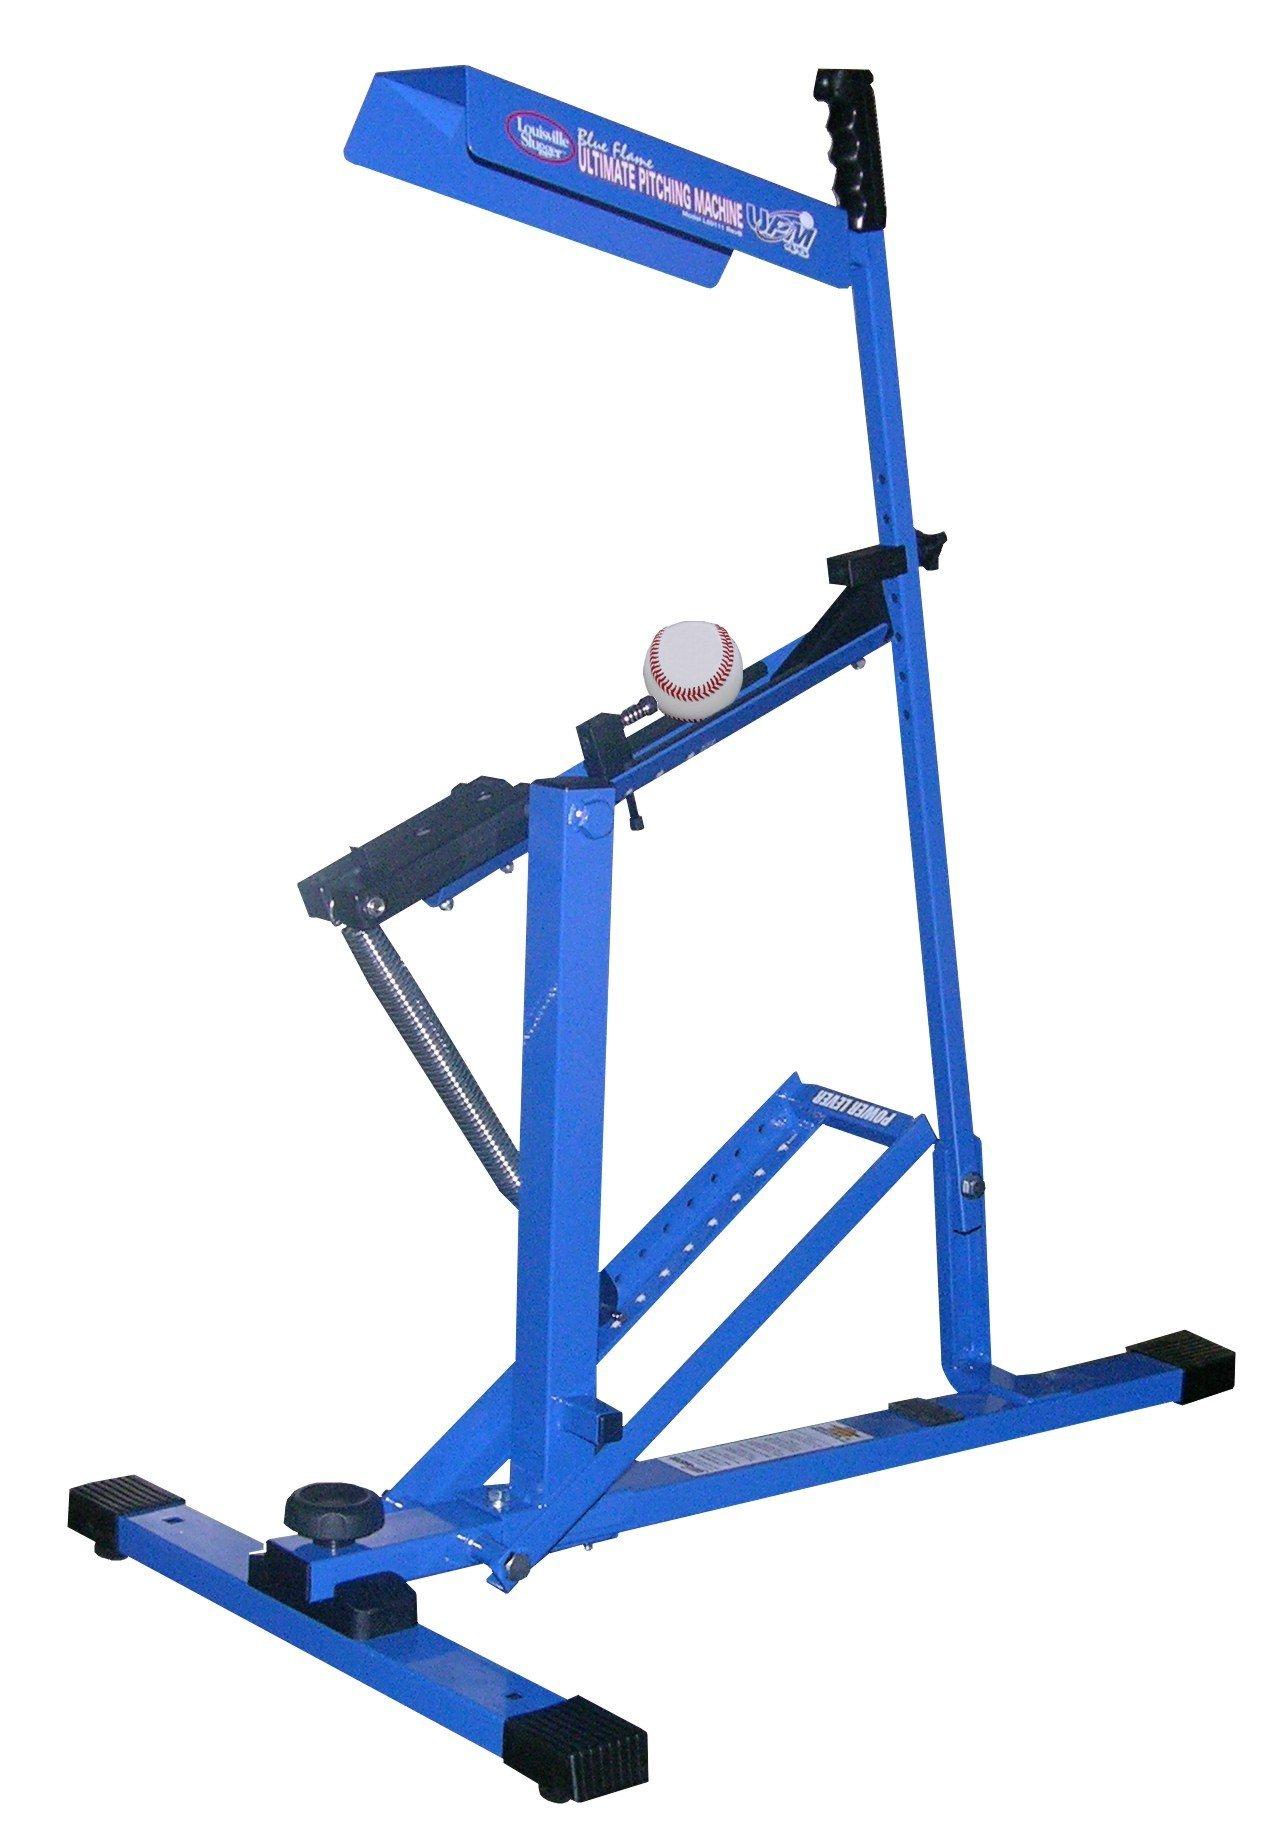 Louisville Slugger UPM 45 Blue Flame Pitching Machine (Renewed) by Louisville Slugger